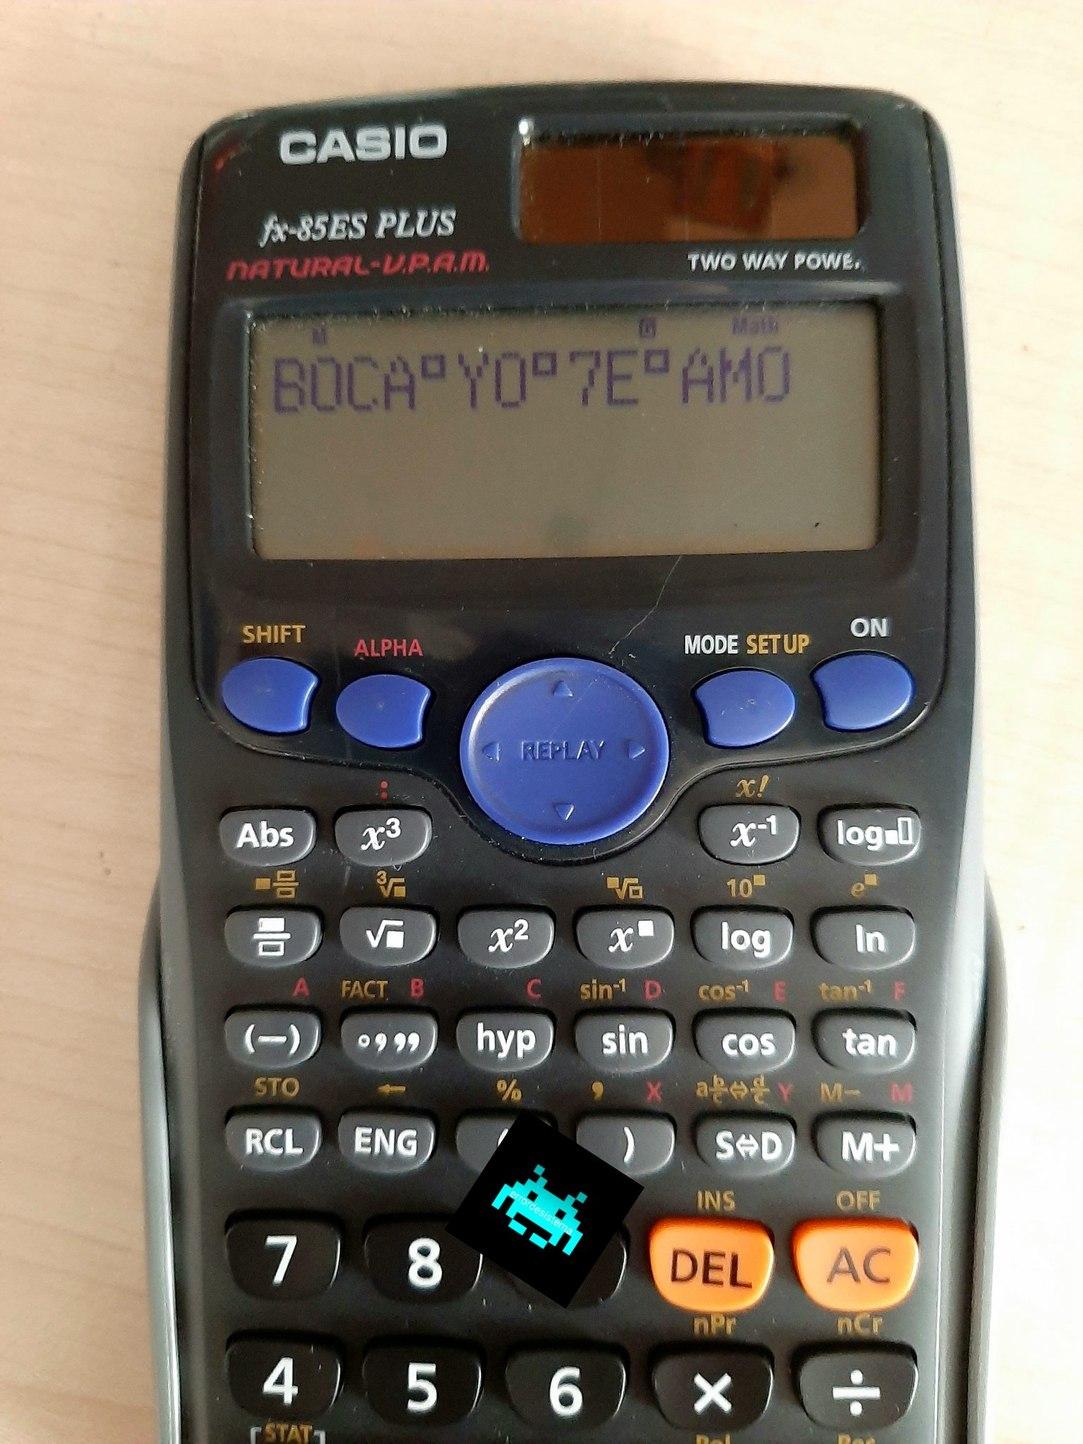 Me aburro mucho en clase de física - meme